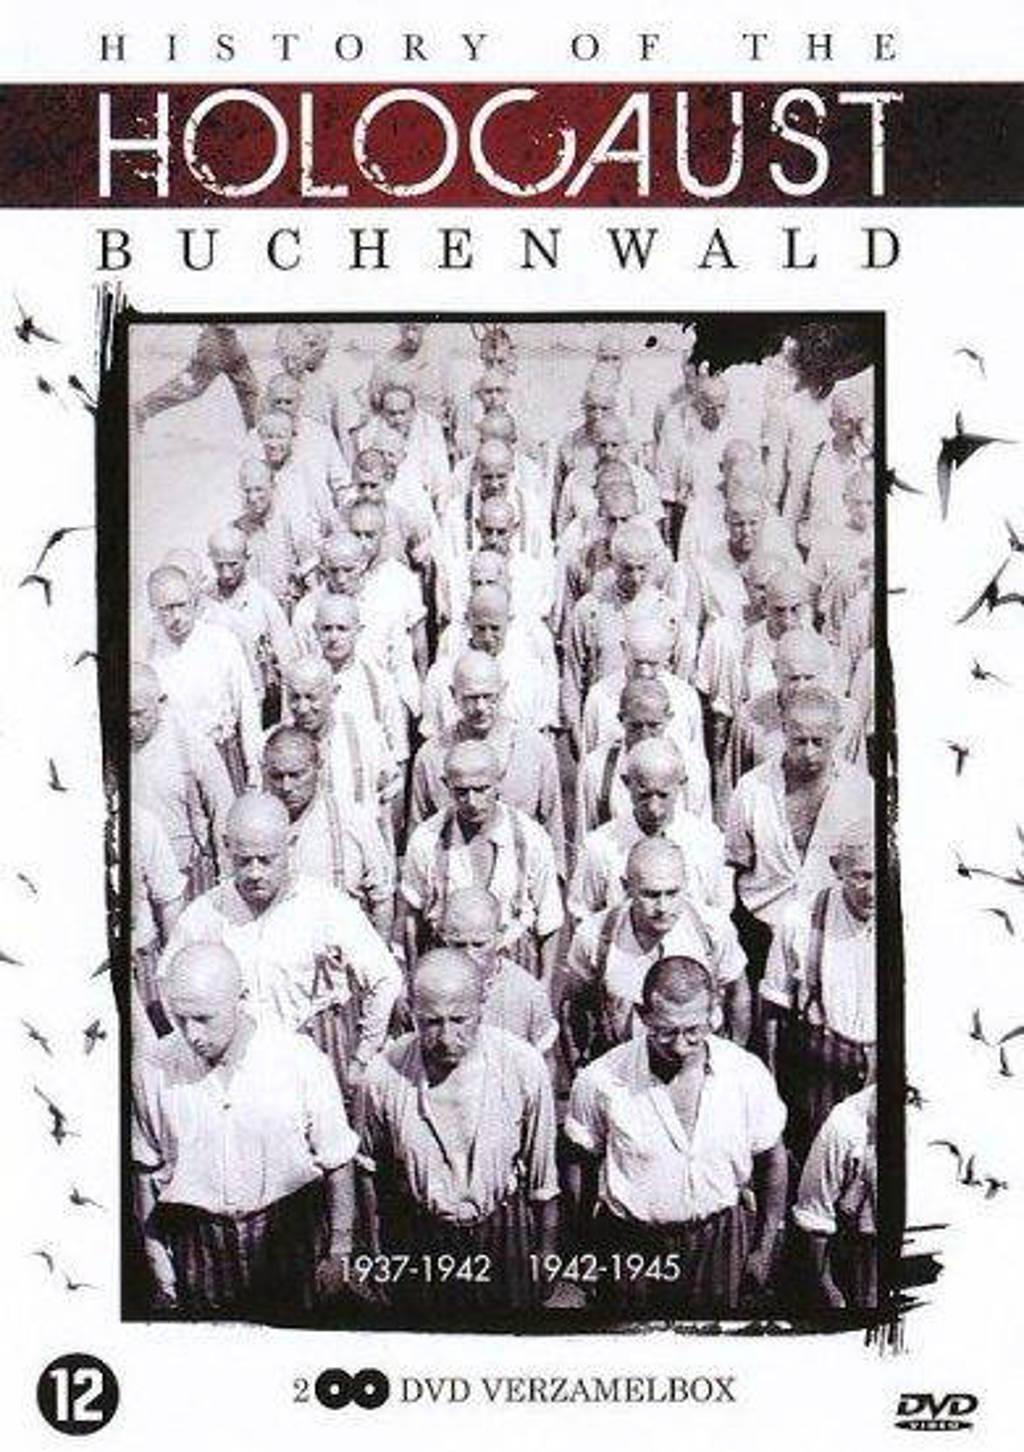 History of the holocaust - Buchenwald (DVD)